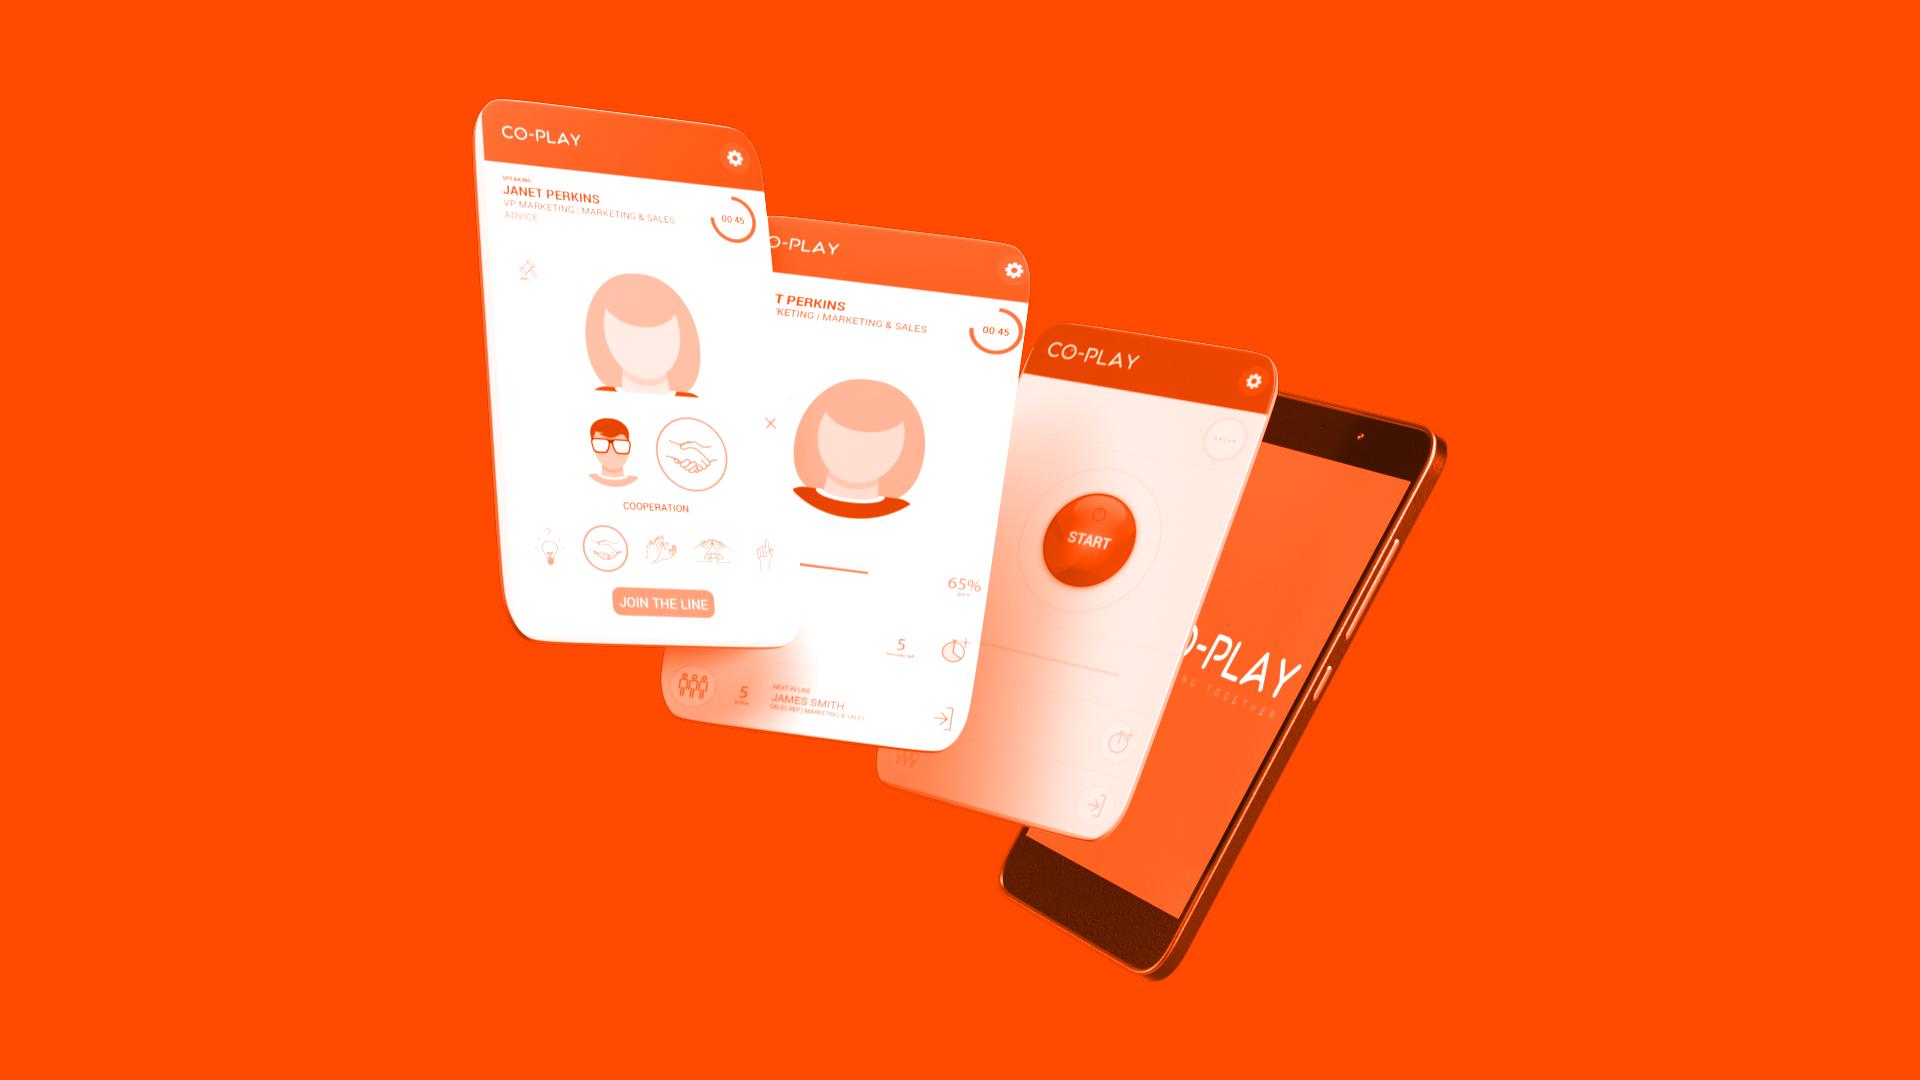 App design UI startup עיצוב אפליקציה עיצוב ממשק משתמש co-play